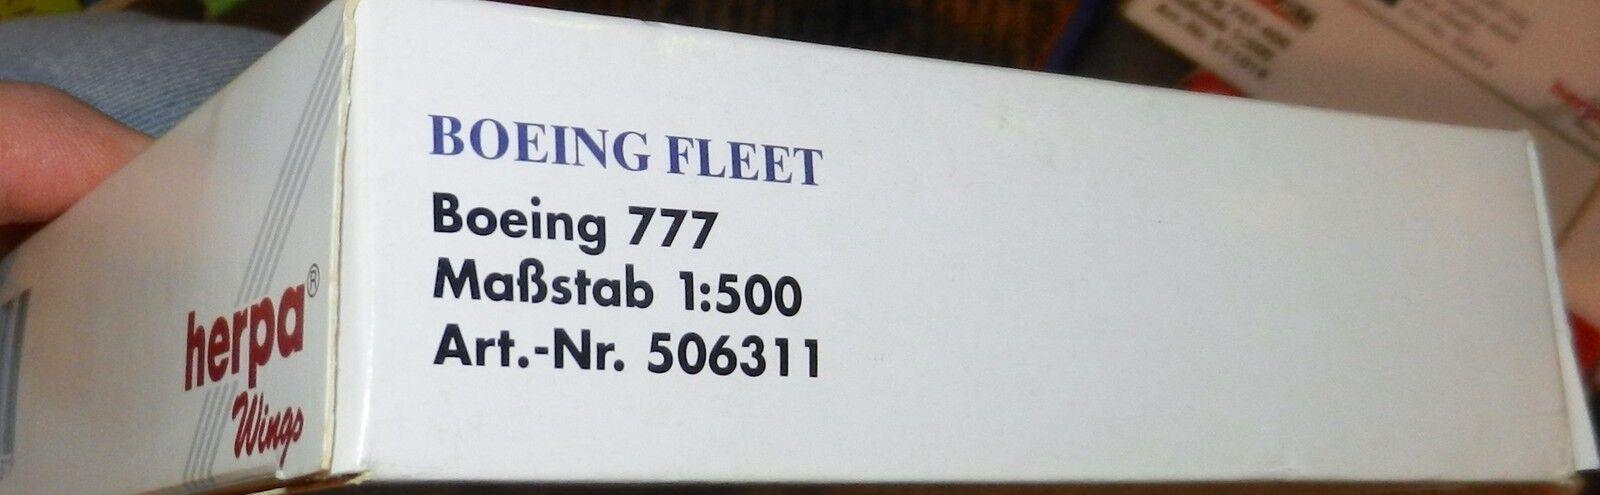 Herpa 506311 Boeing Fleet 1981 1981 1981 Demo House colors Boeing 777-200 1 500 Scale Mint 74b9f7